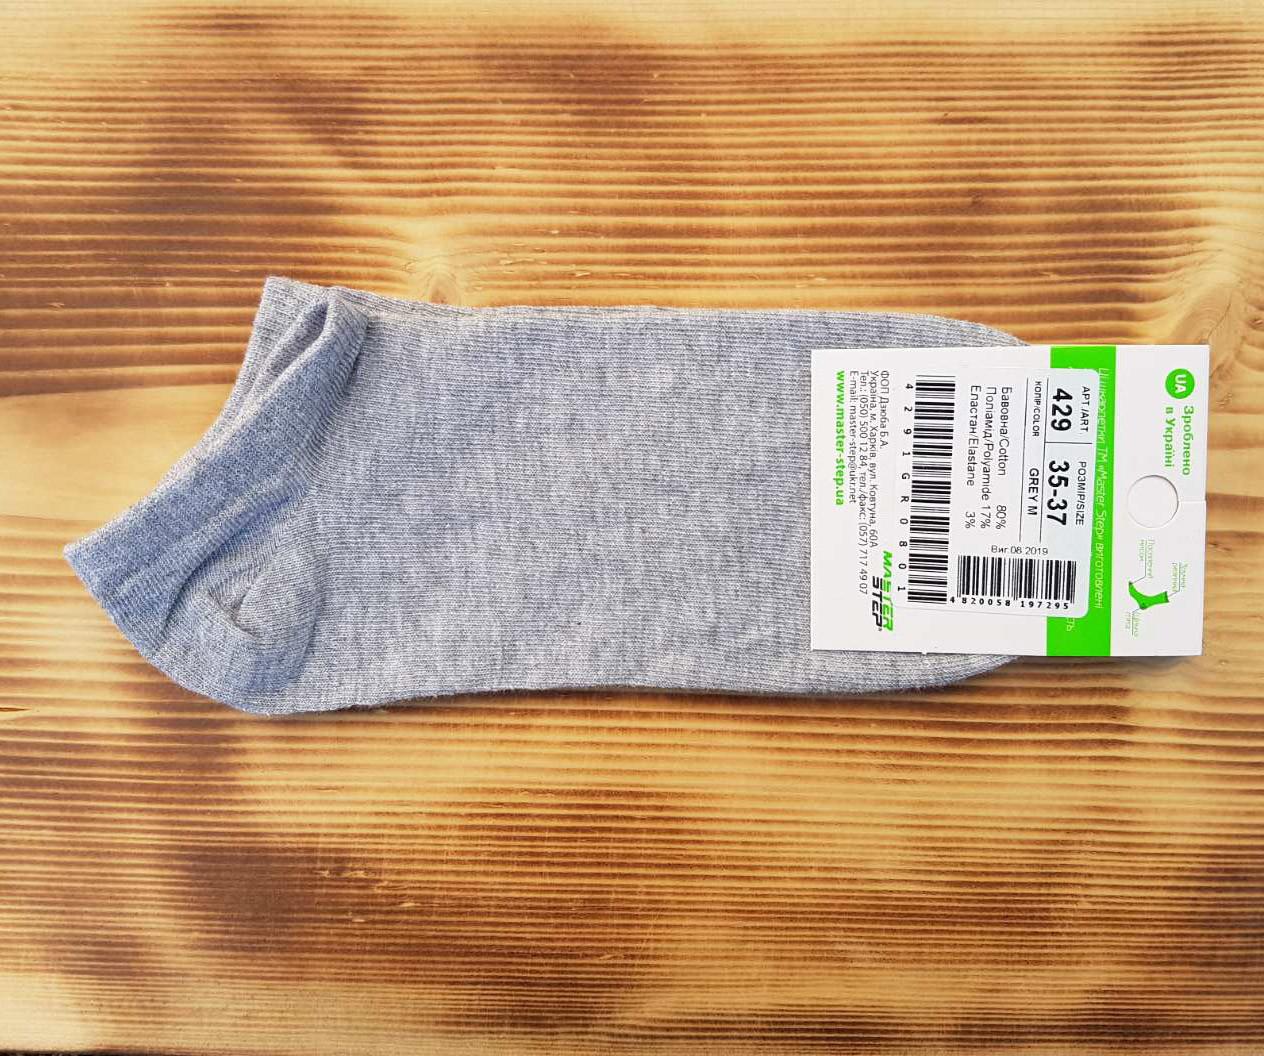 Носки женские, укороченные, цвет: серый меланж, размер 23 / 35-37р.